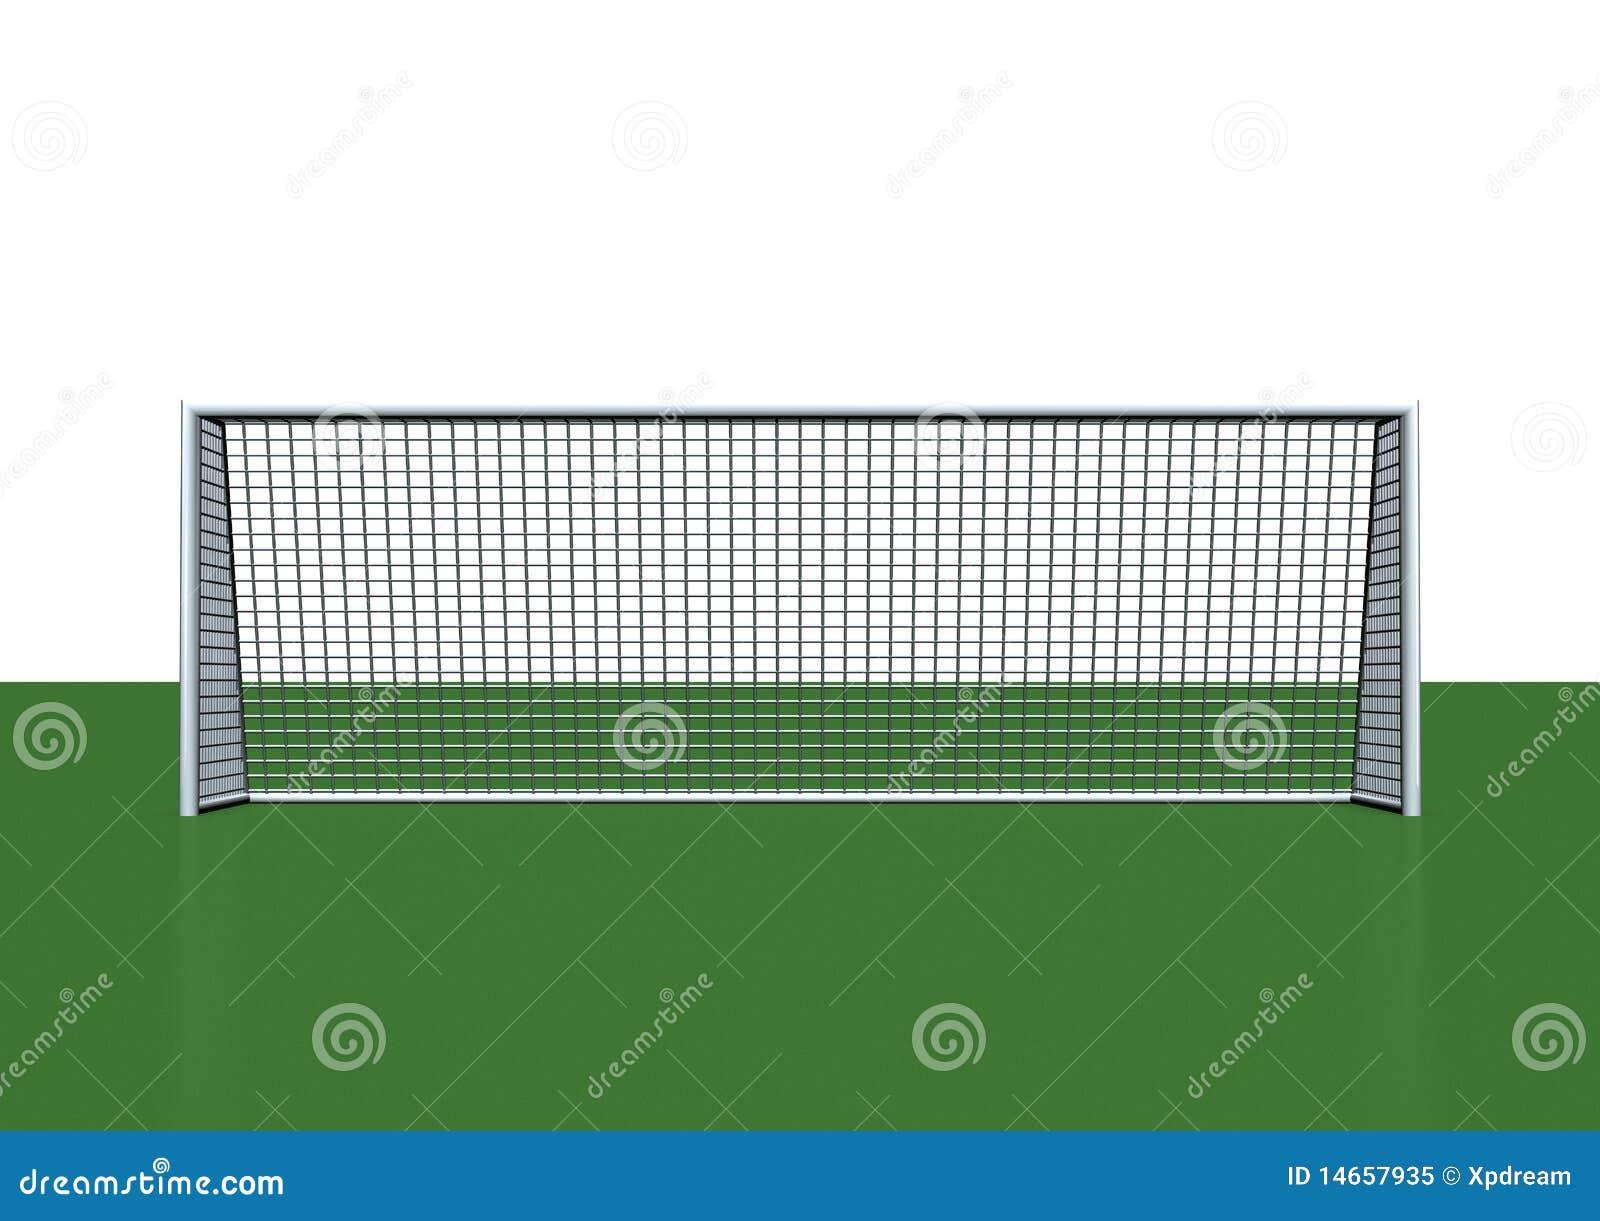 football net clipart - photo #28